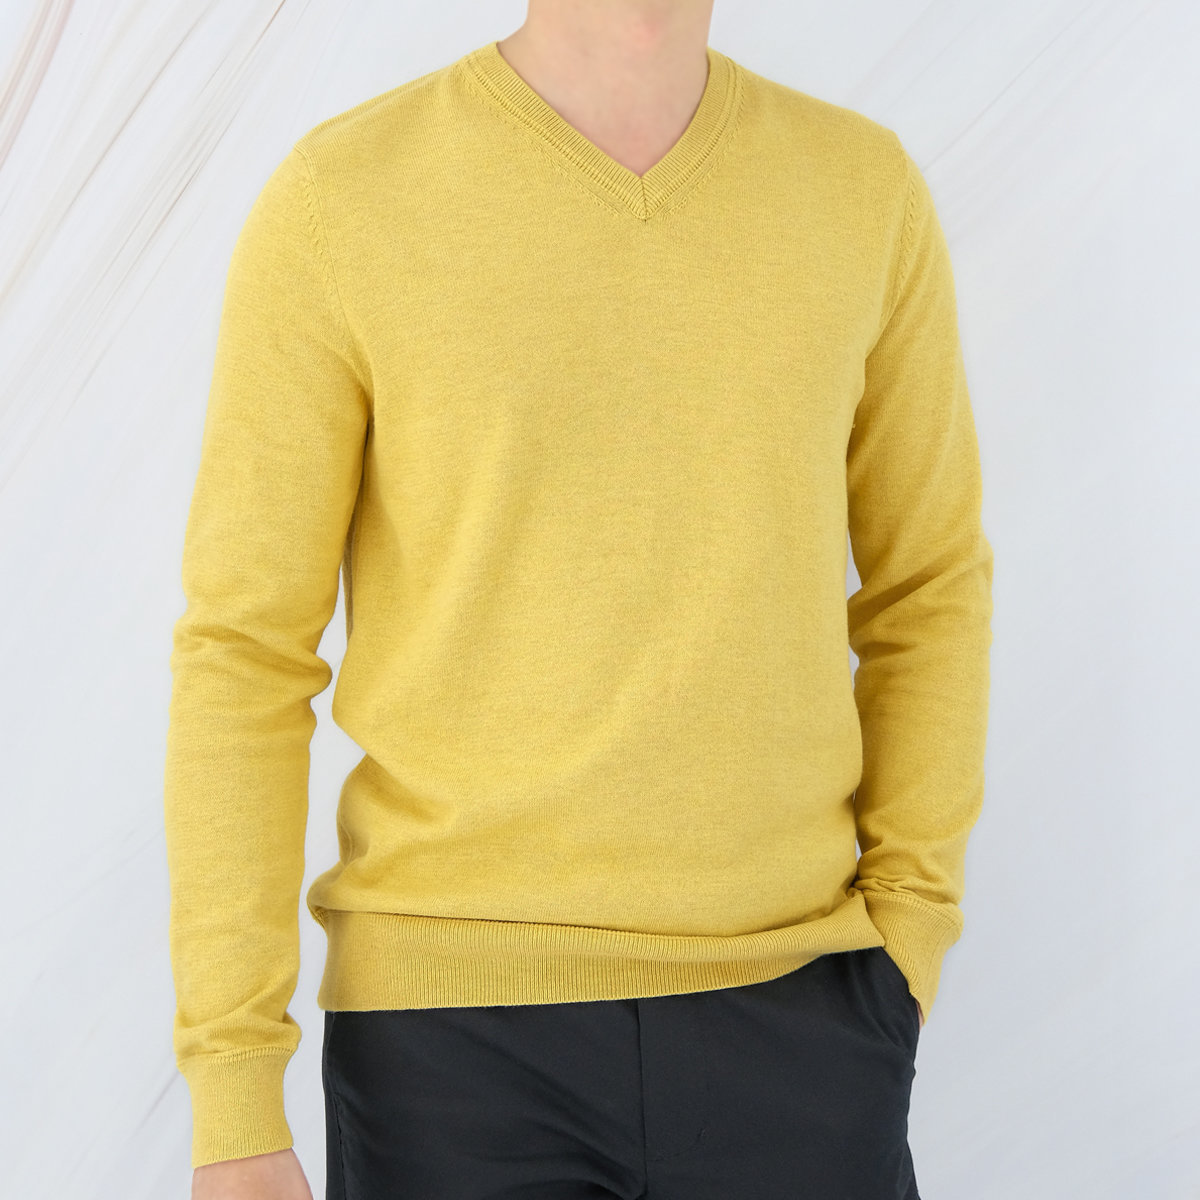 Men's Cotton Blend V-neck Sweater (Curry)